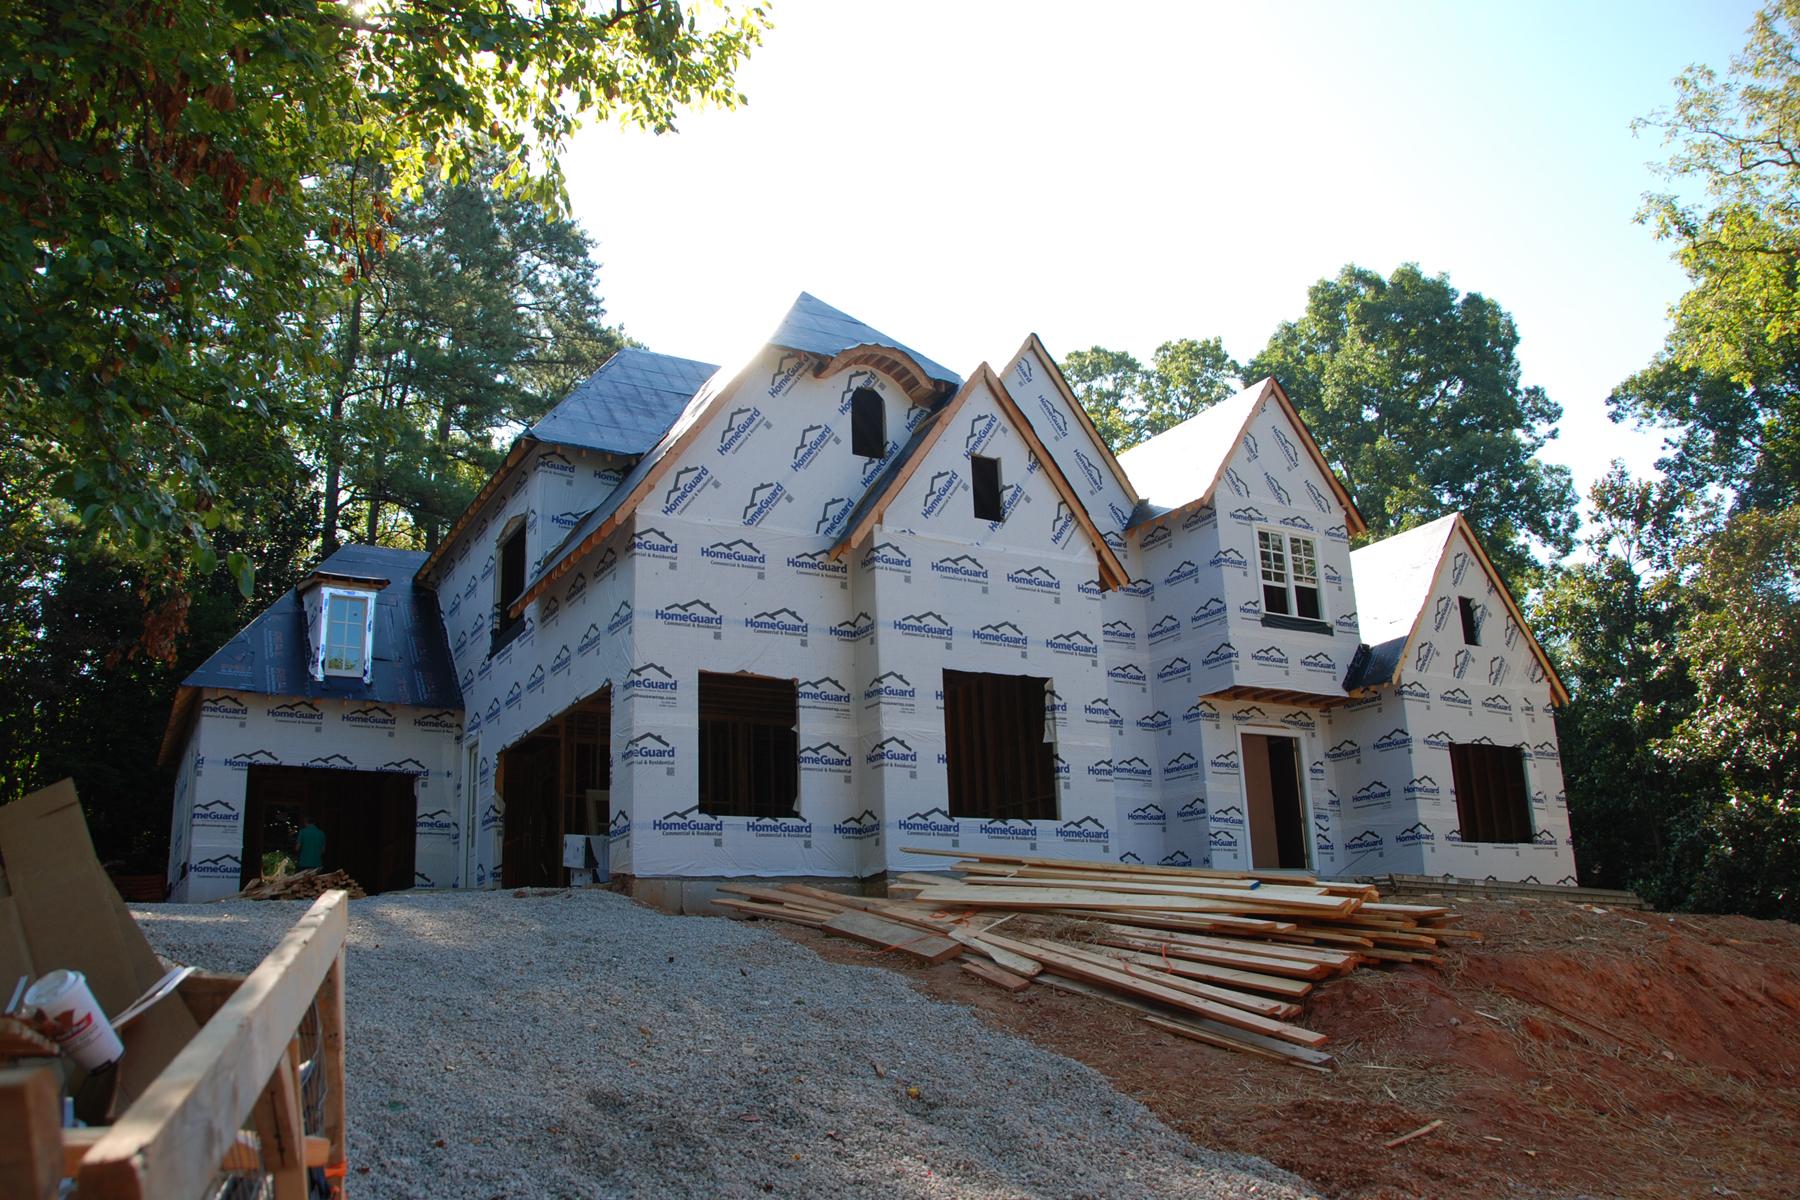 獨棟家庭住宅 為 出售 在 Chastain Area New Construction 192 Pine Lake Drive Sandy Springs, 喬治亞州 30327 美國